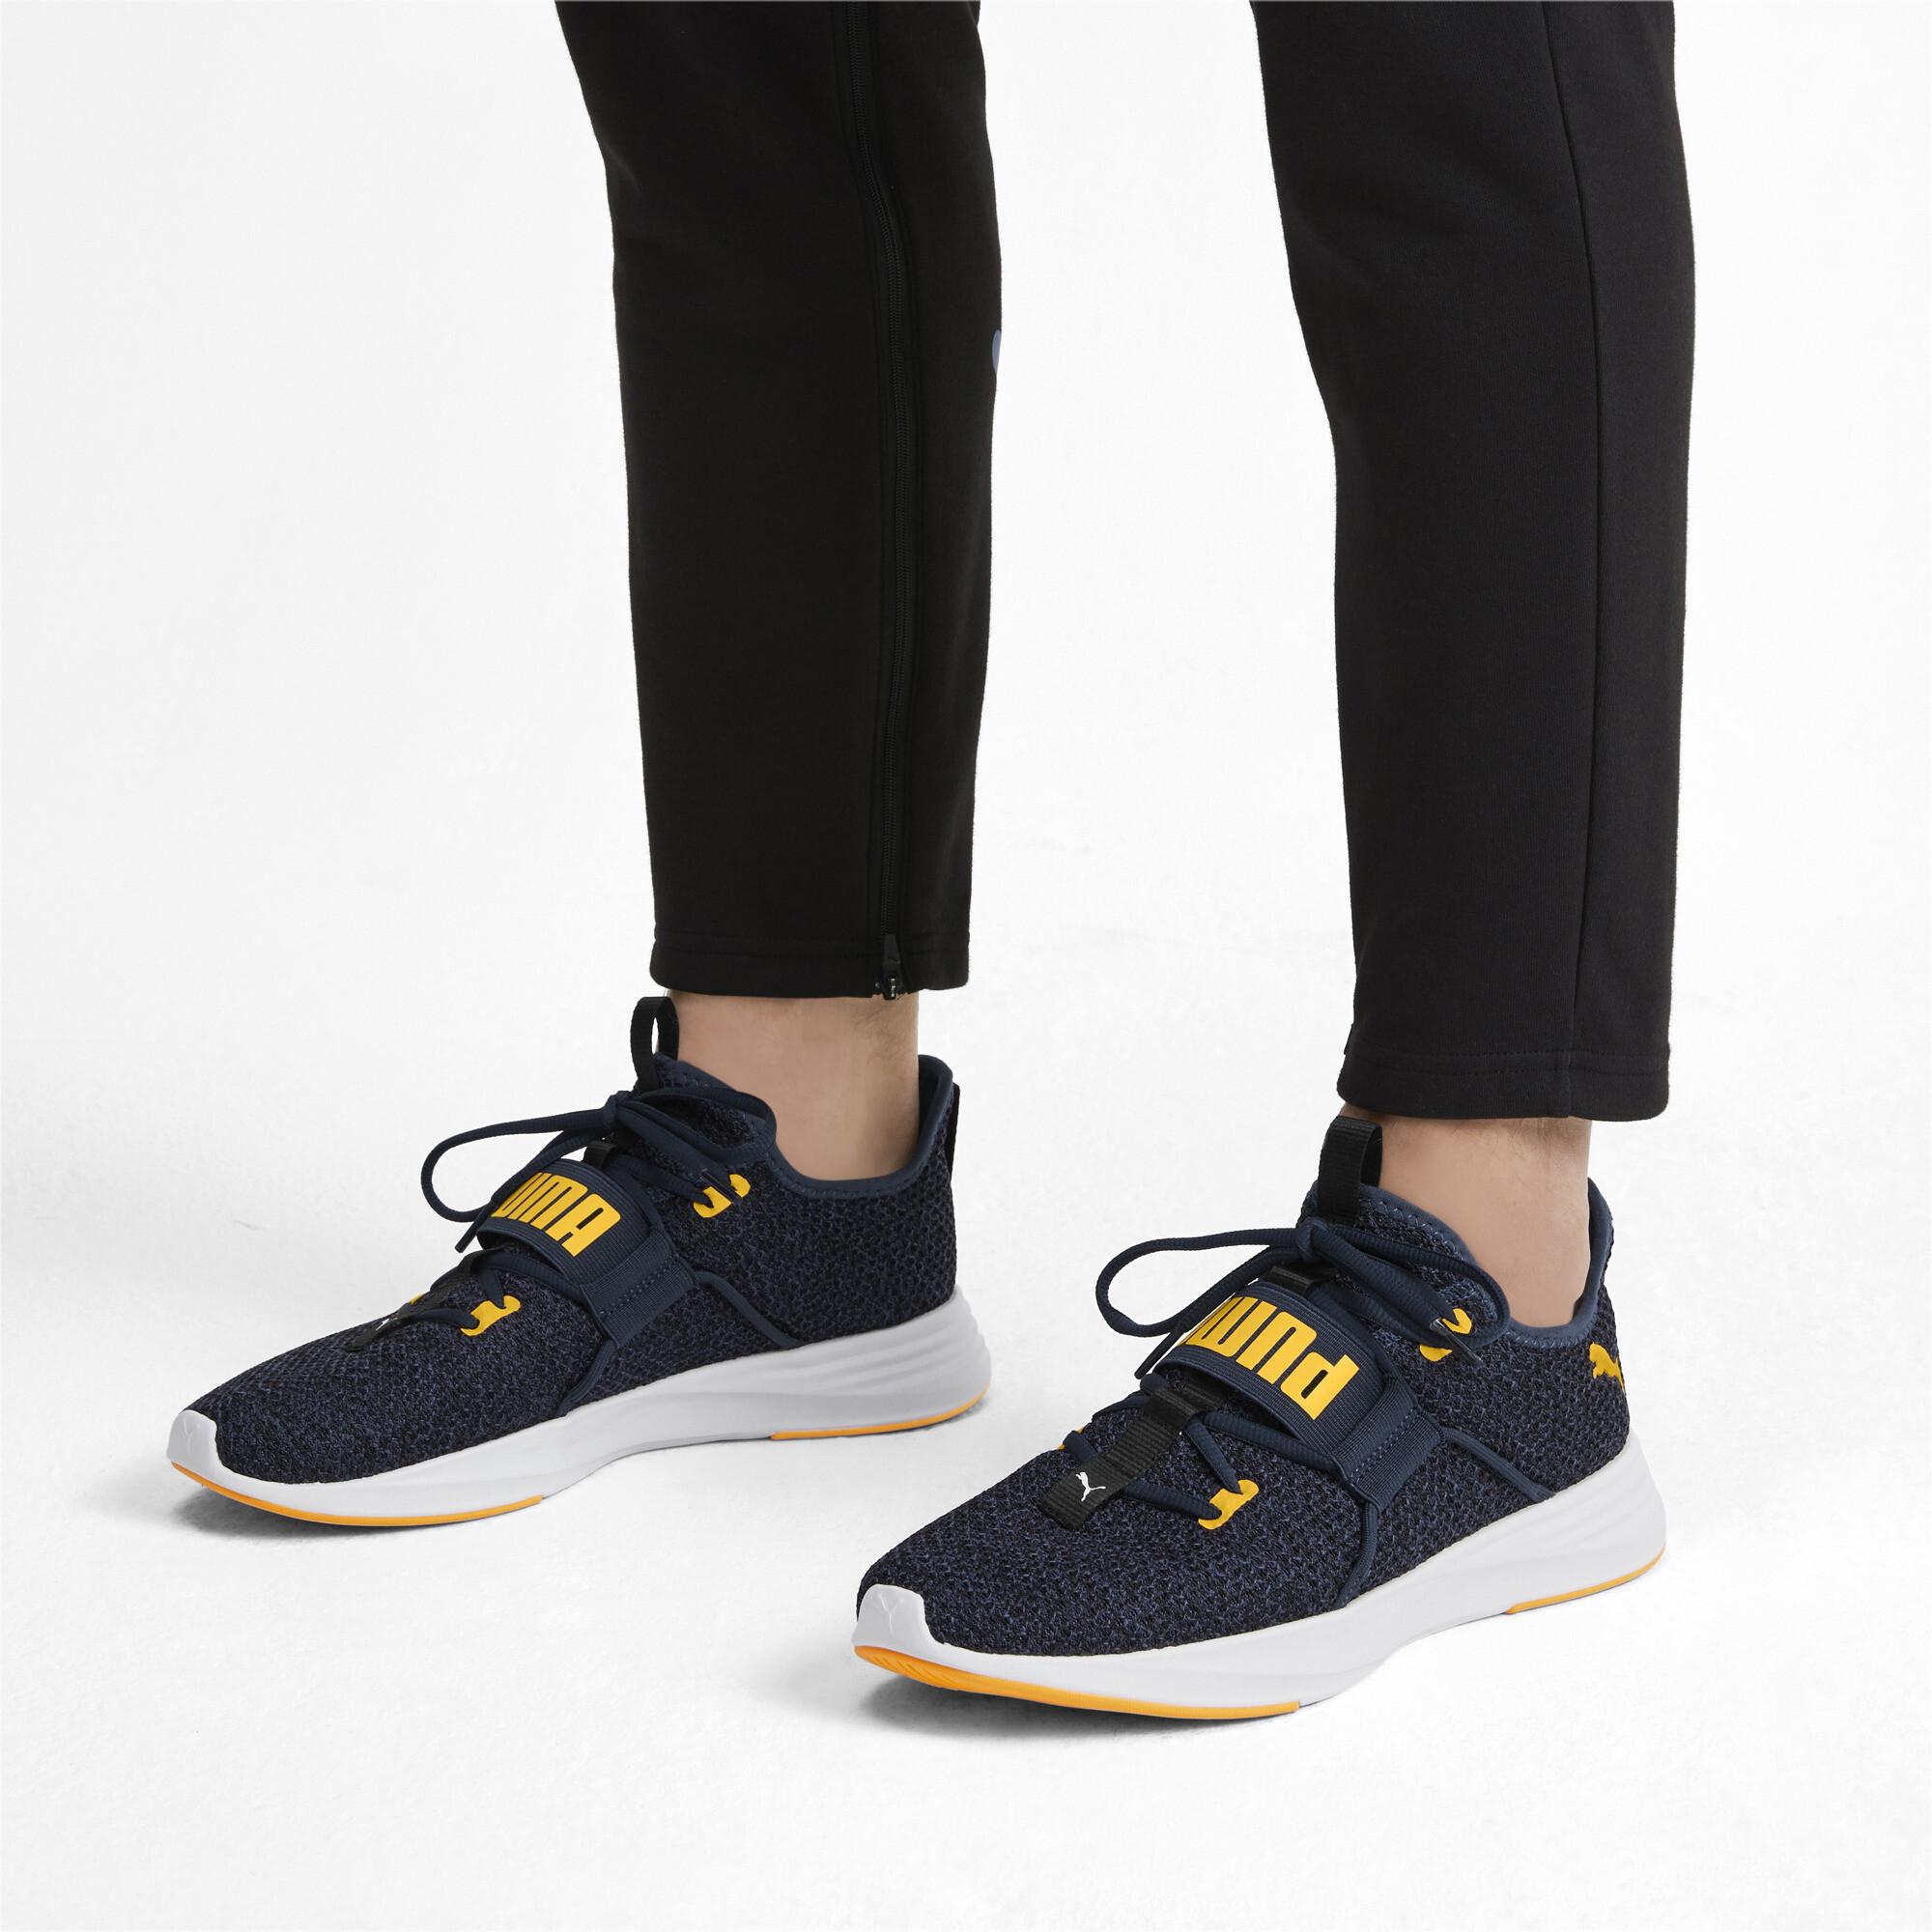 PUMA-Men-039-s-Persist-XT-Knit-Training-Shoes thumbnail 19